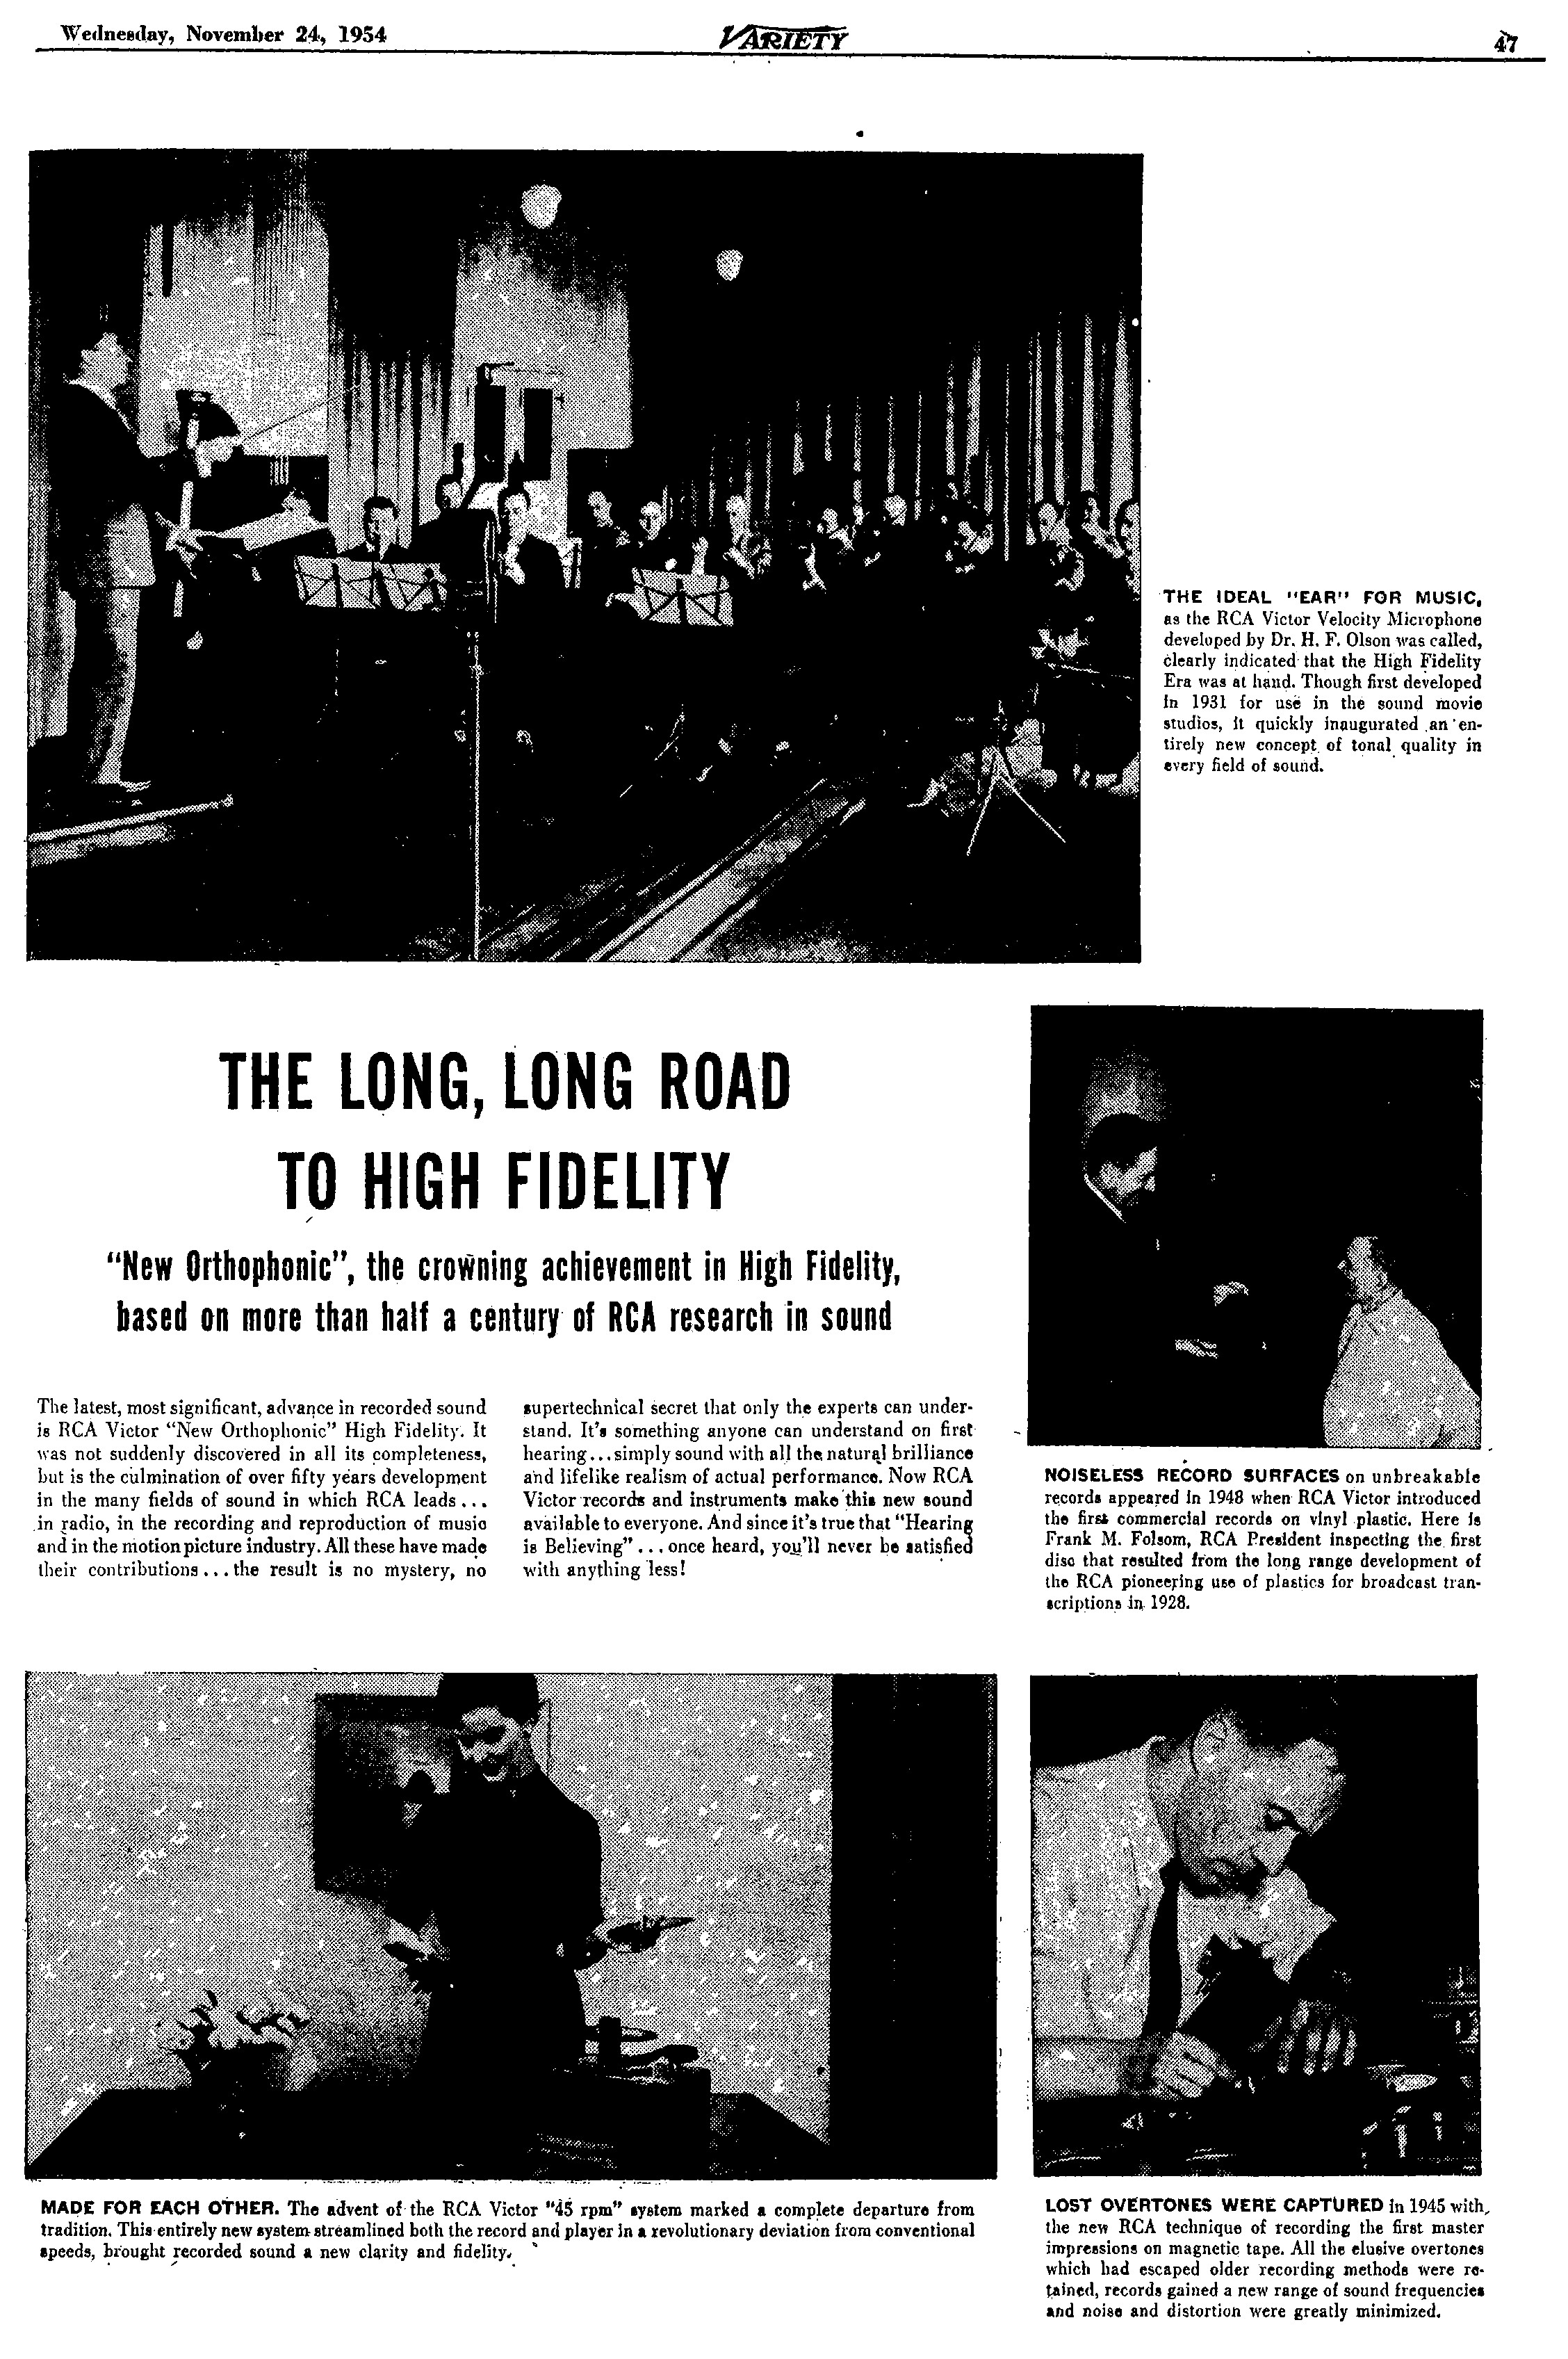 Variety196-1954-11_jp2.zip&file=variety196-1954-11_jp2%2fvariety196-1954-11_0262